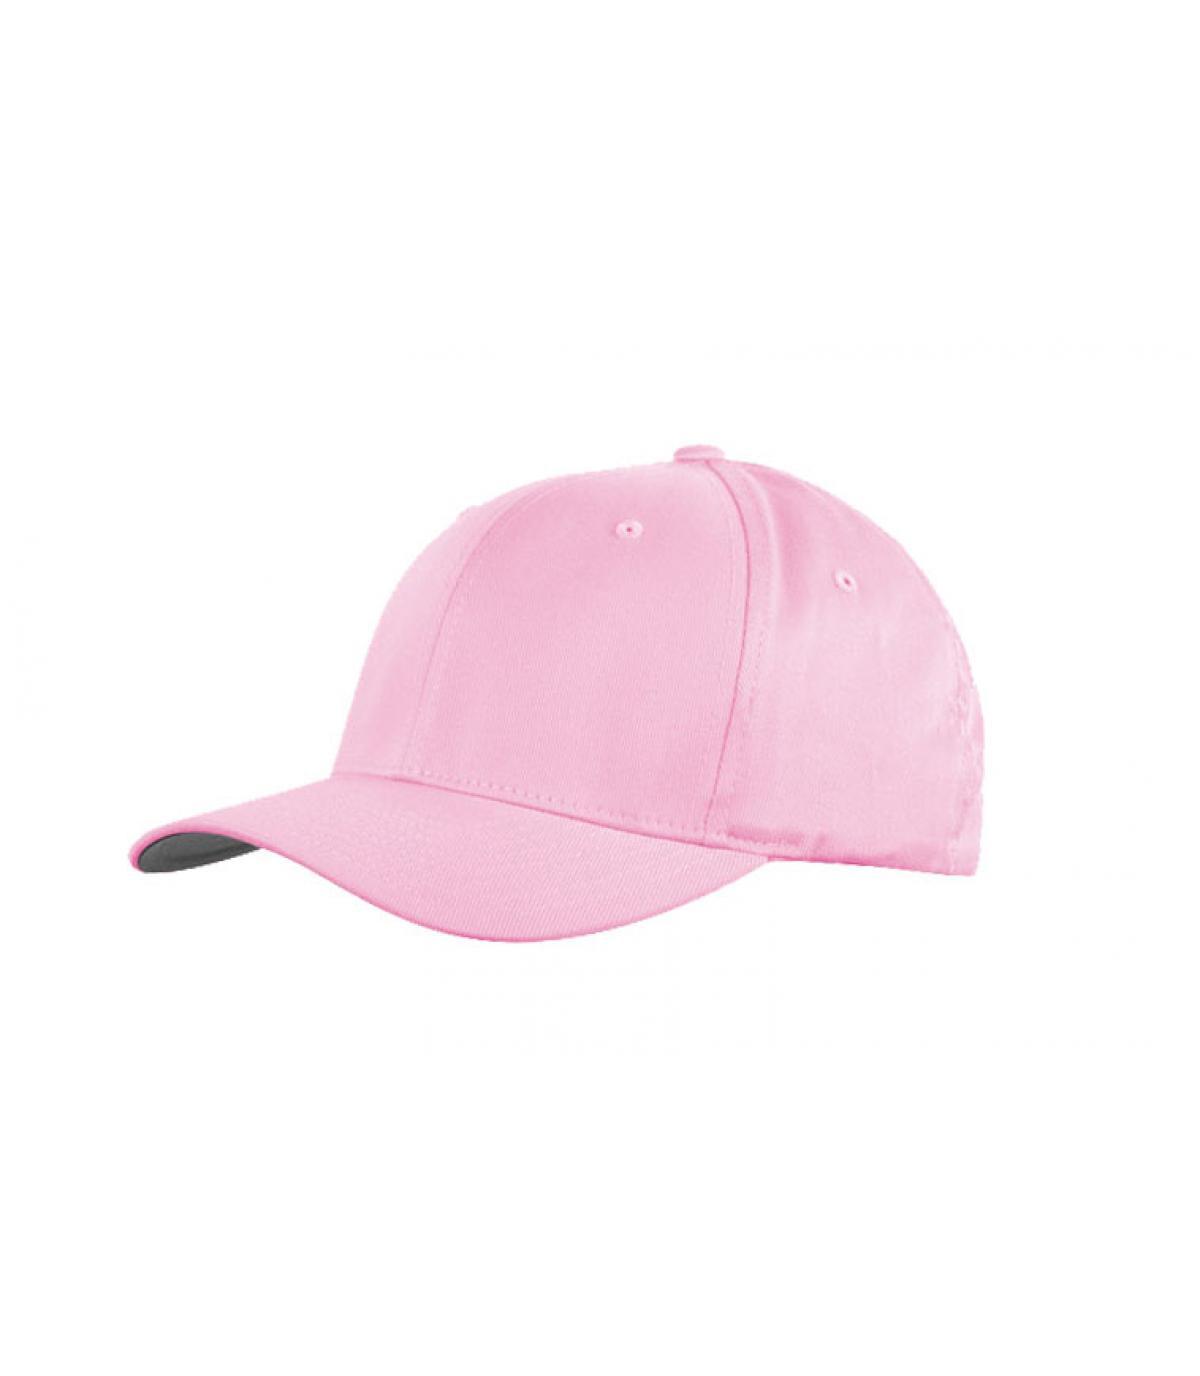 Detalles Flexfit cap pink imagen 2